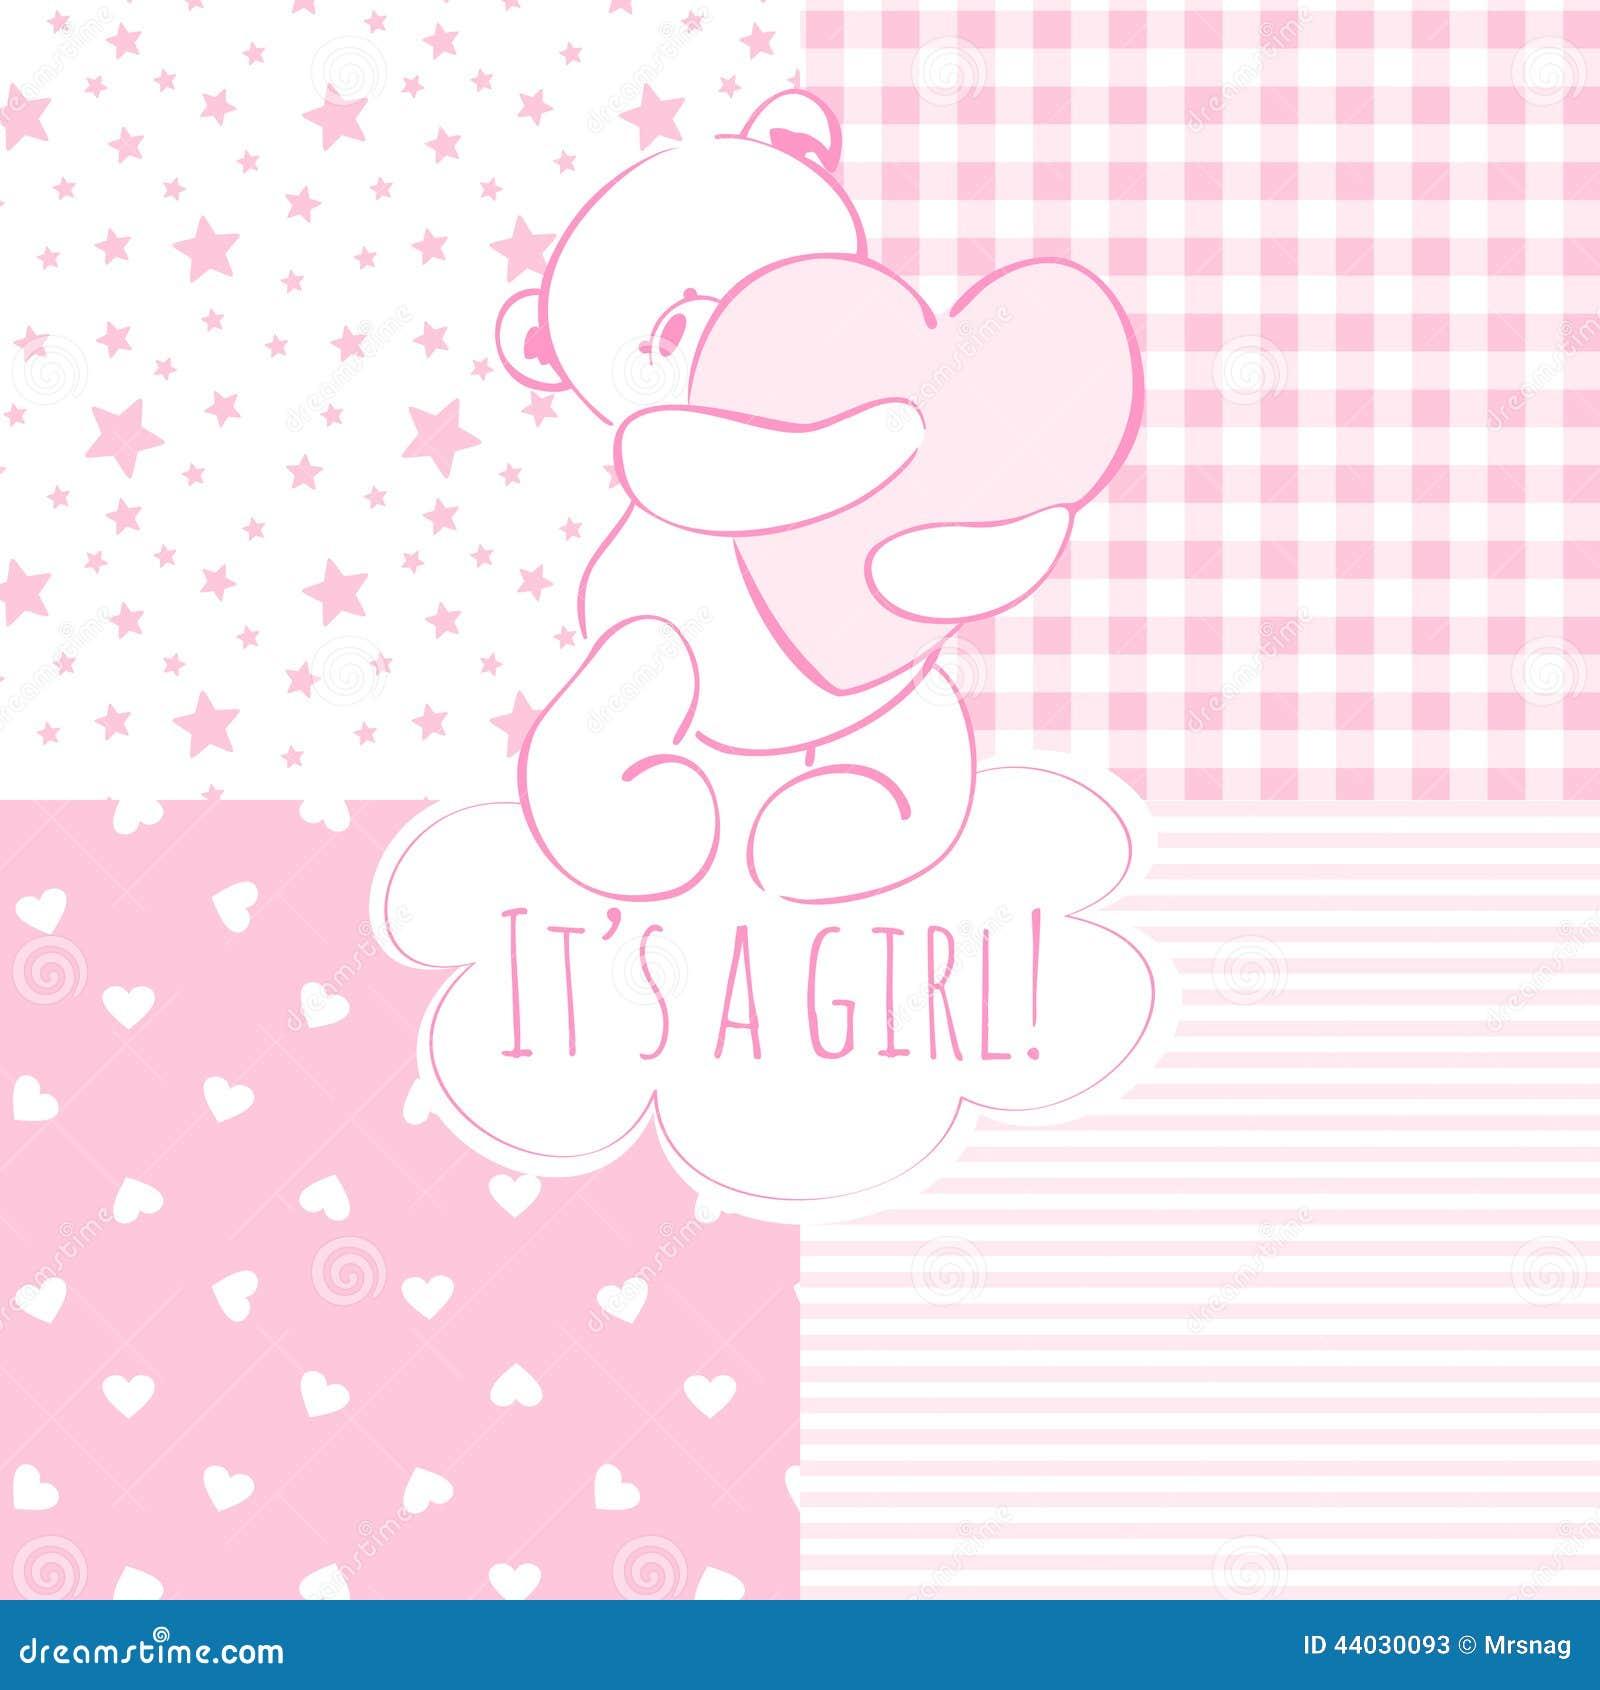 Baby Shower: Girl. Stock Vector - Image: 44030093